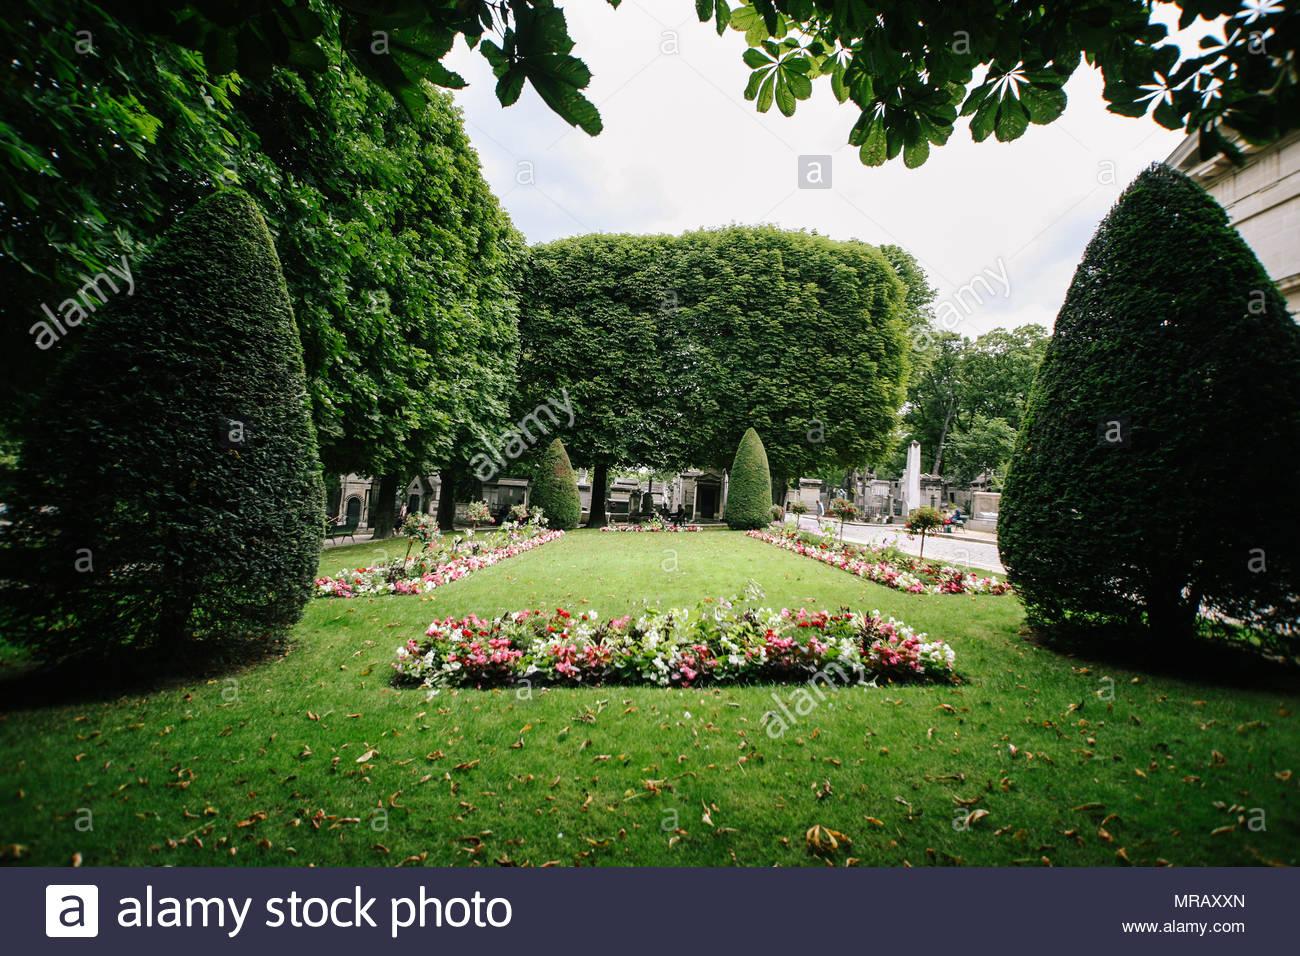 pere lachaise cemetery MRAXXN